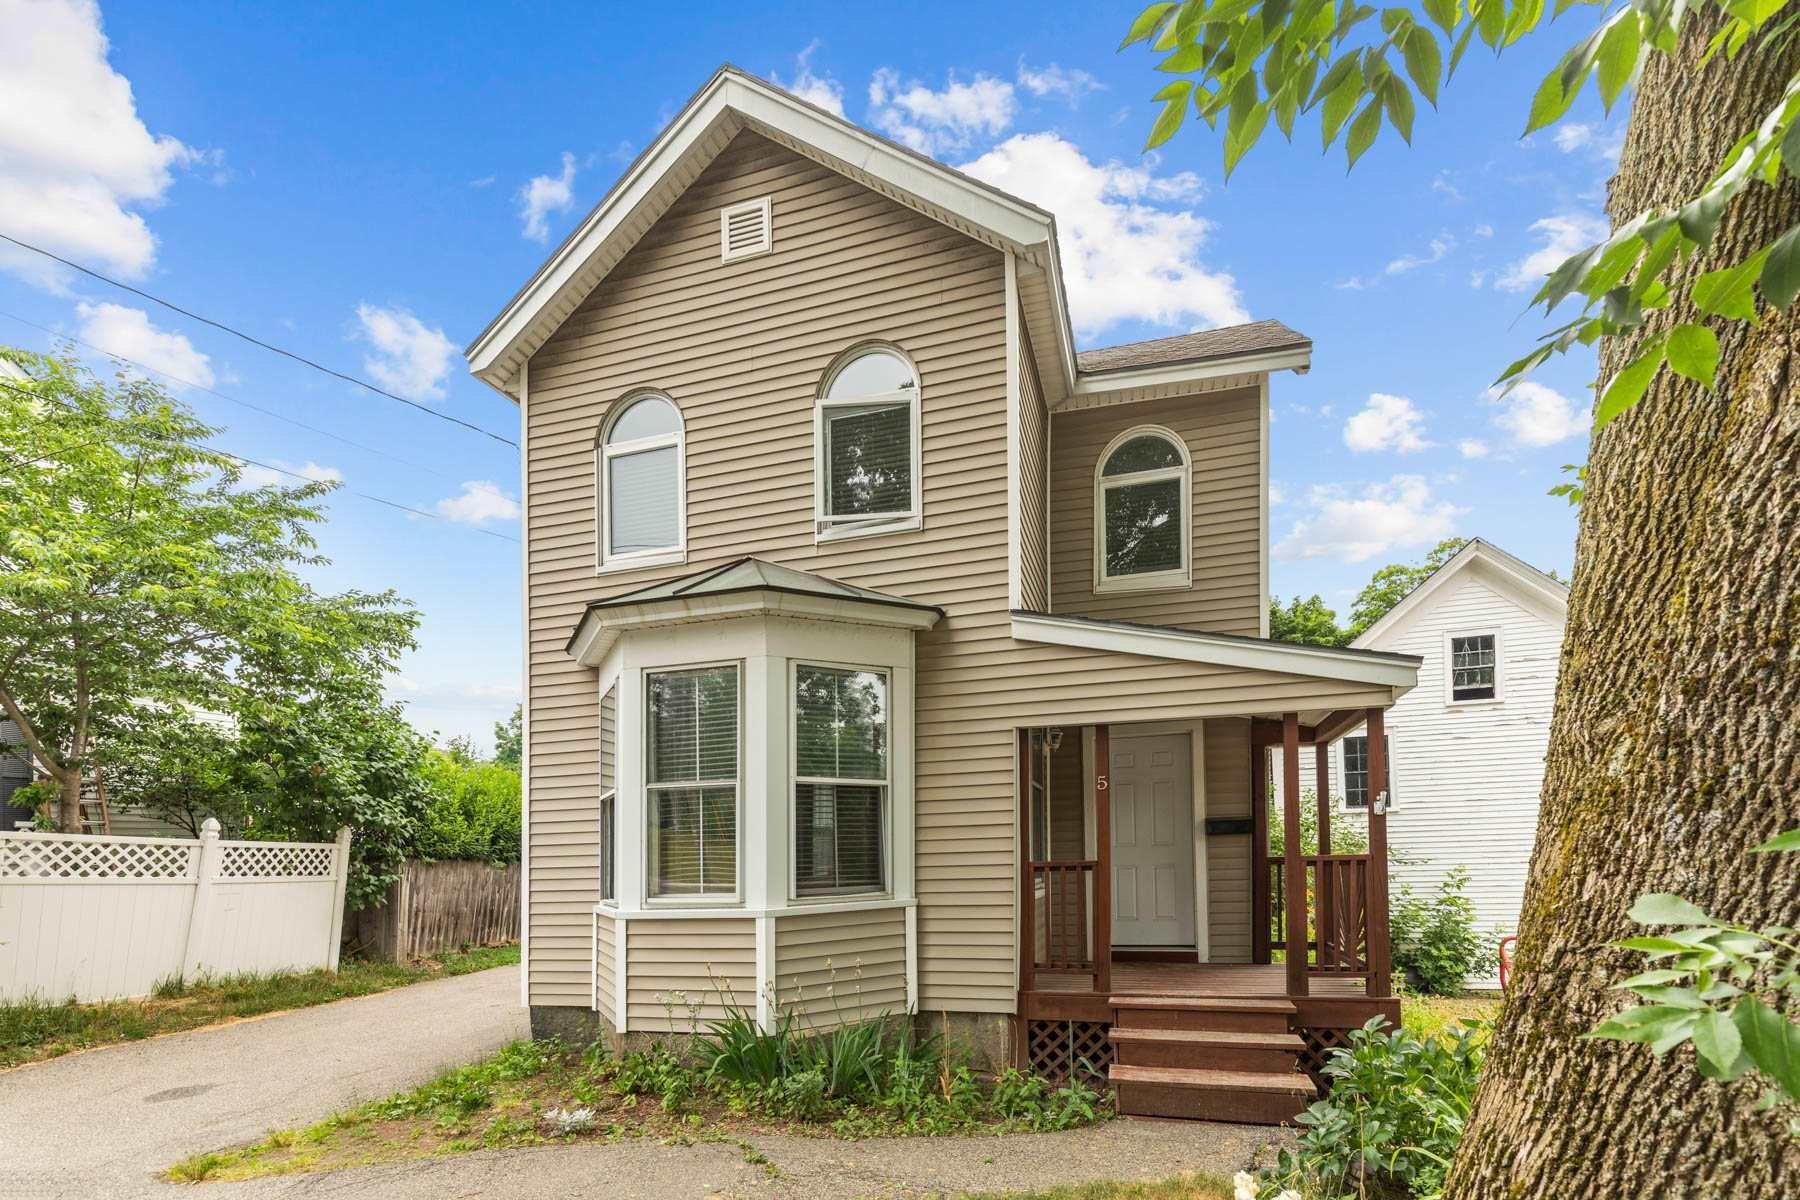 5 Gerry Avenue, Newmarket, NH 03857-1902 - MLS#: 4813374